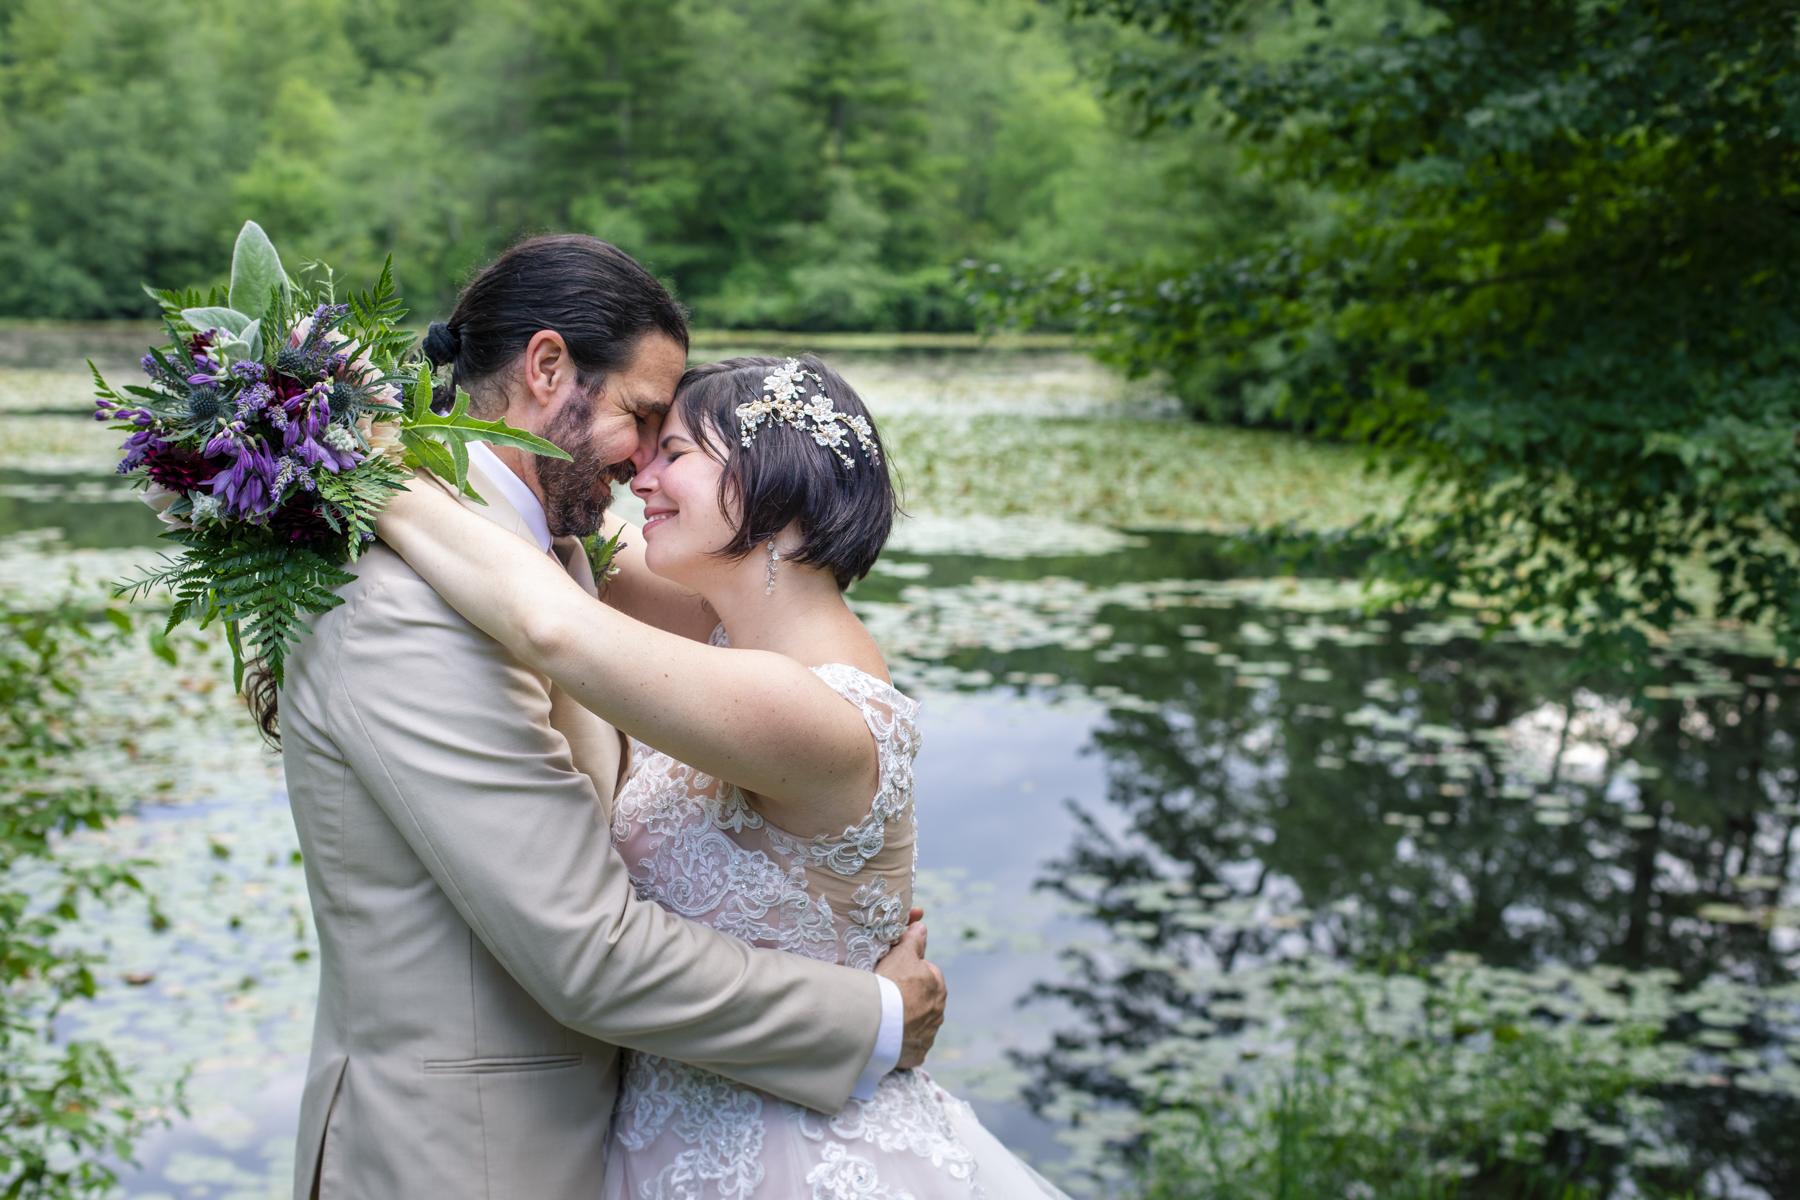 Avyanna and Phoenix Wedding 2019_photos by Studio Misha_BLOG-157.jpg